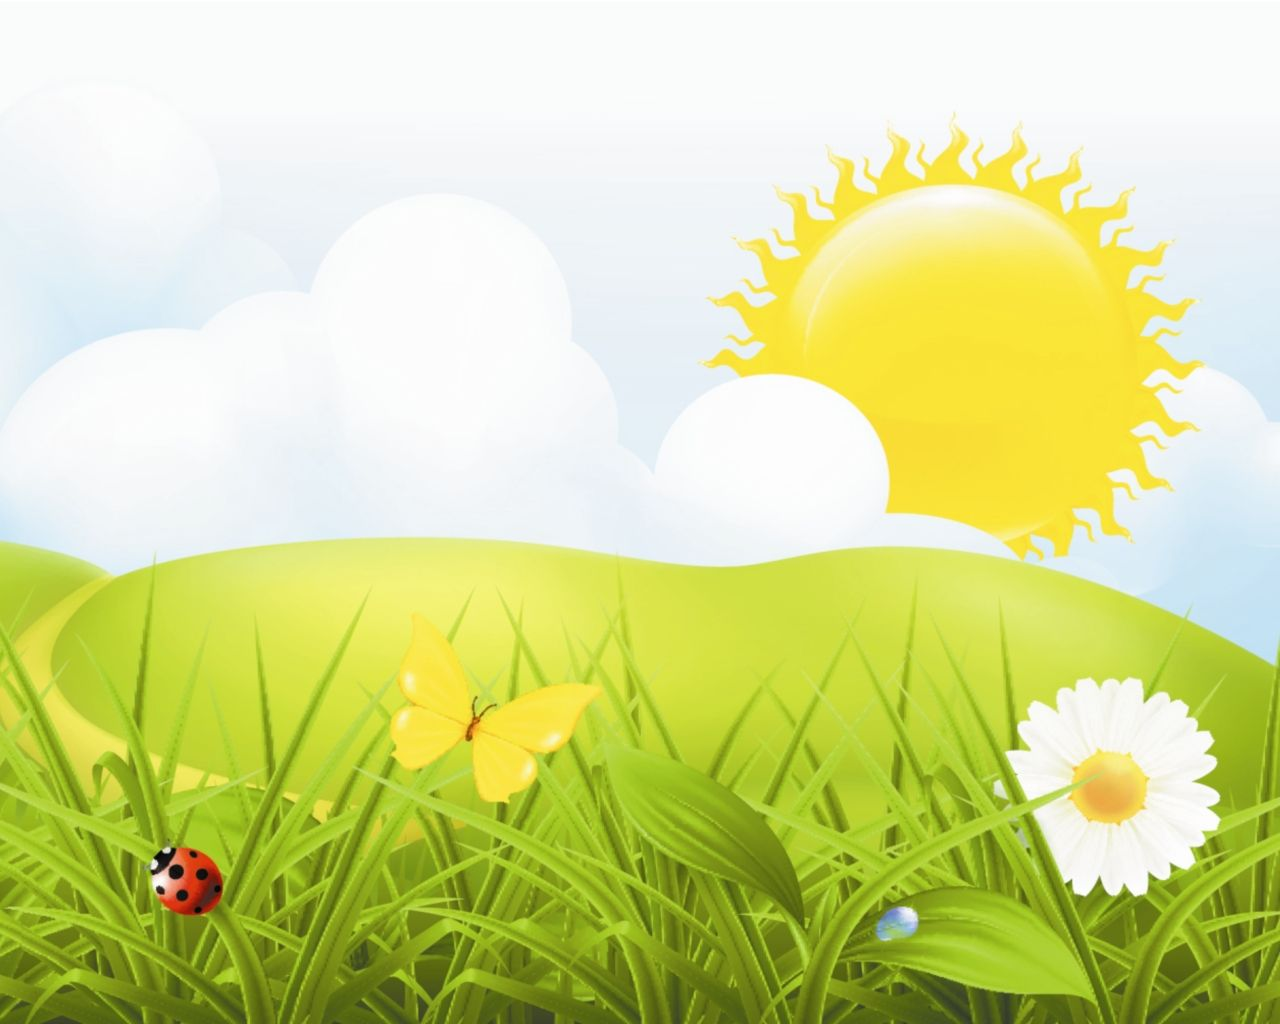 удостоверение рисунок лето солнце квартира после ремонта